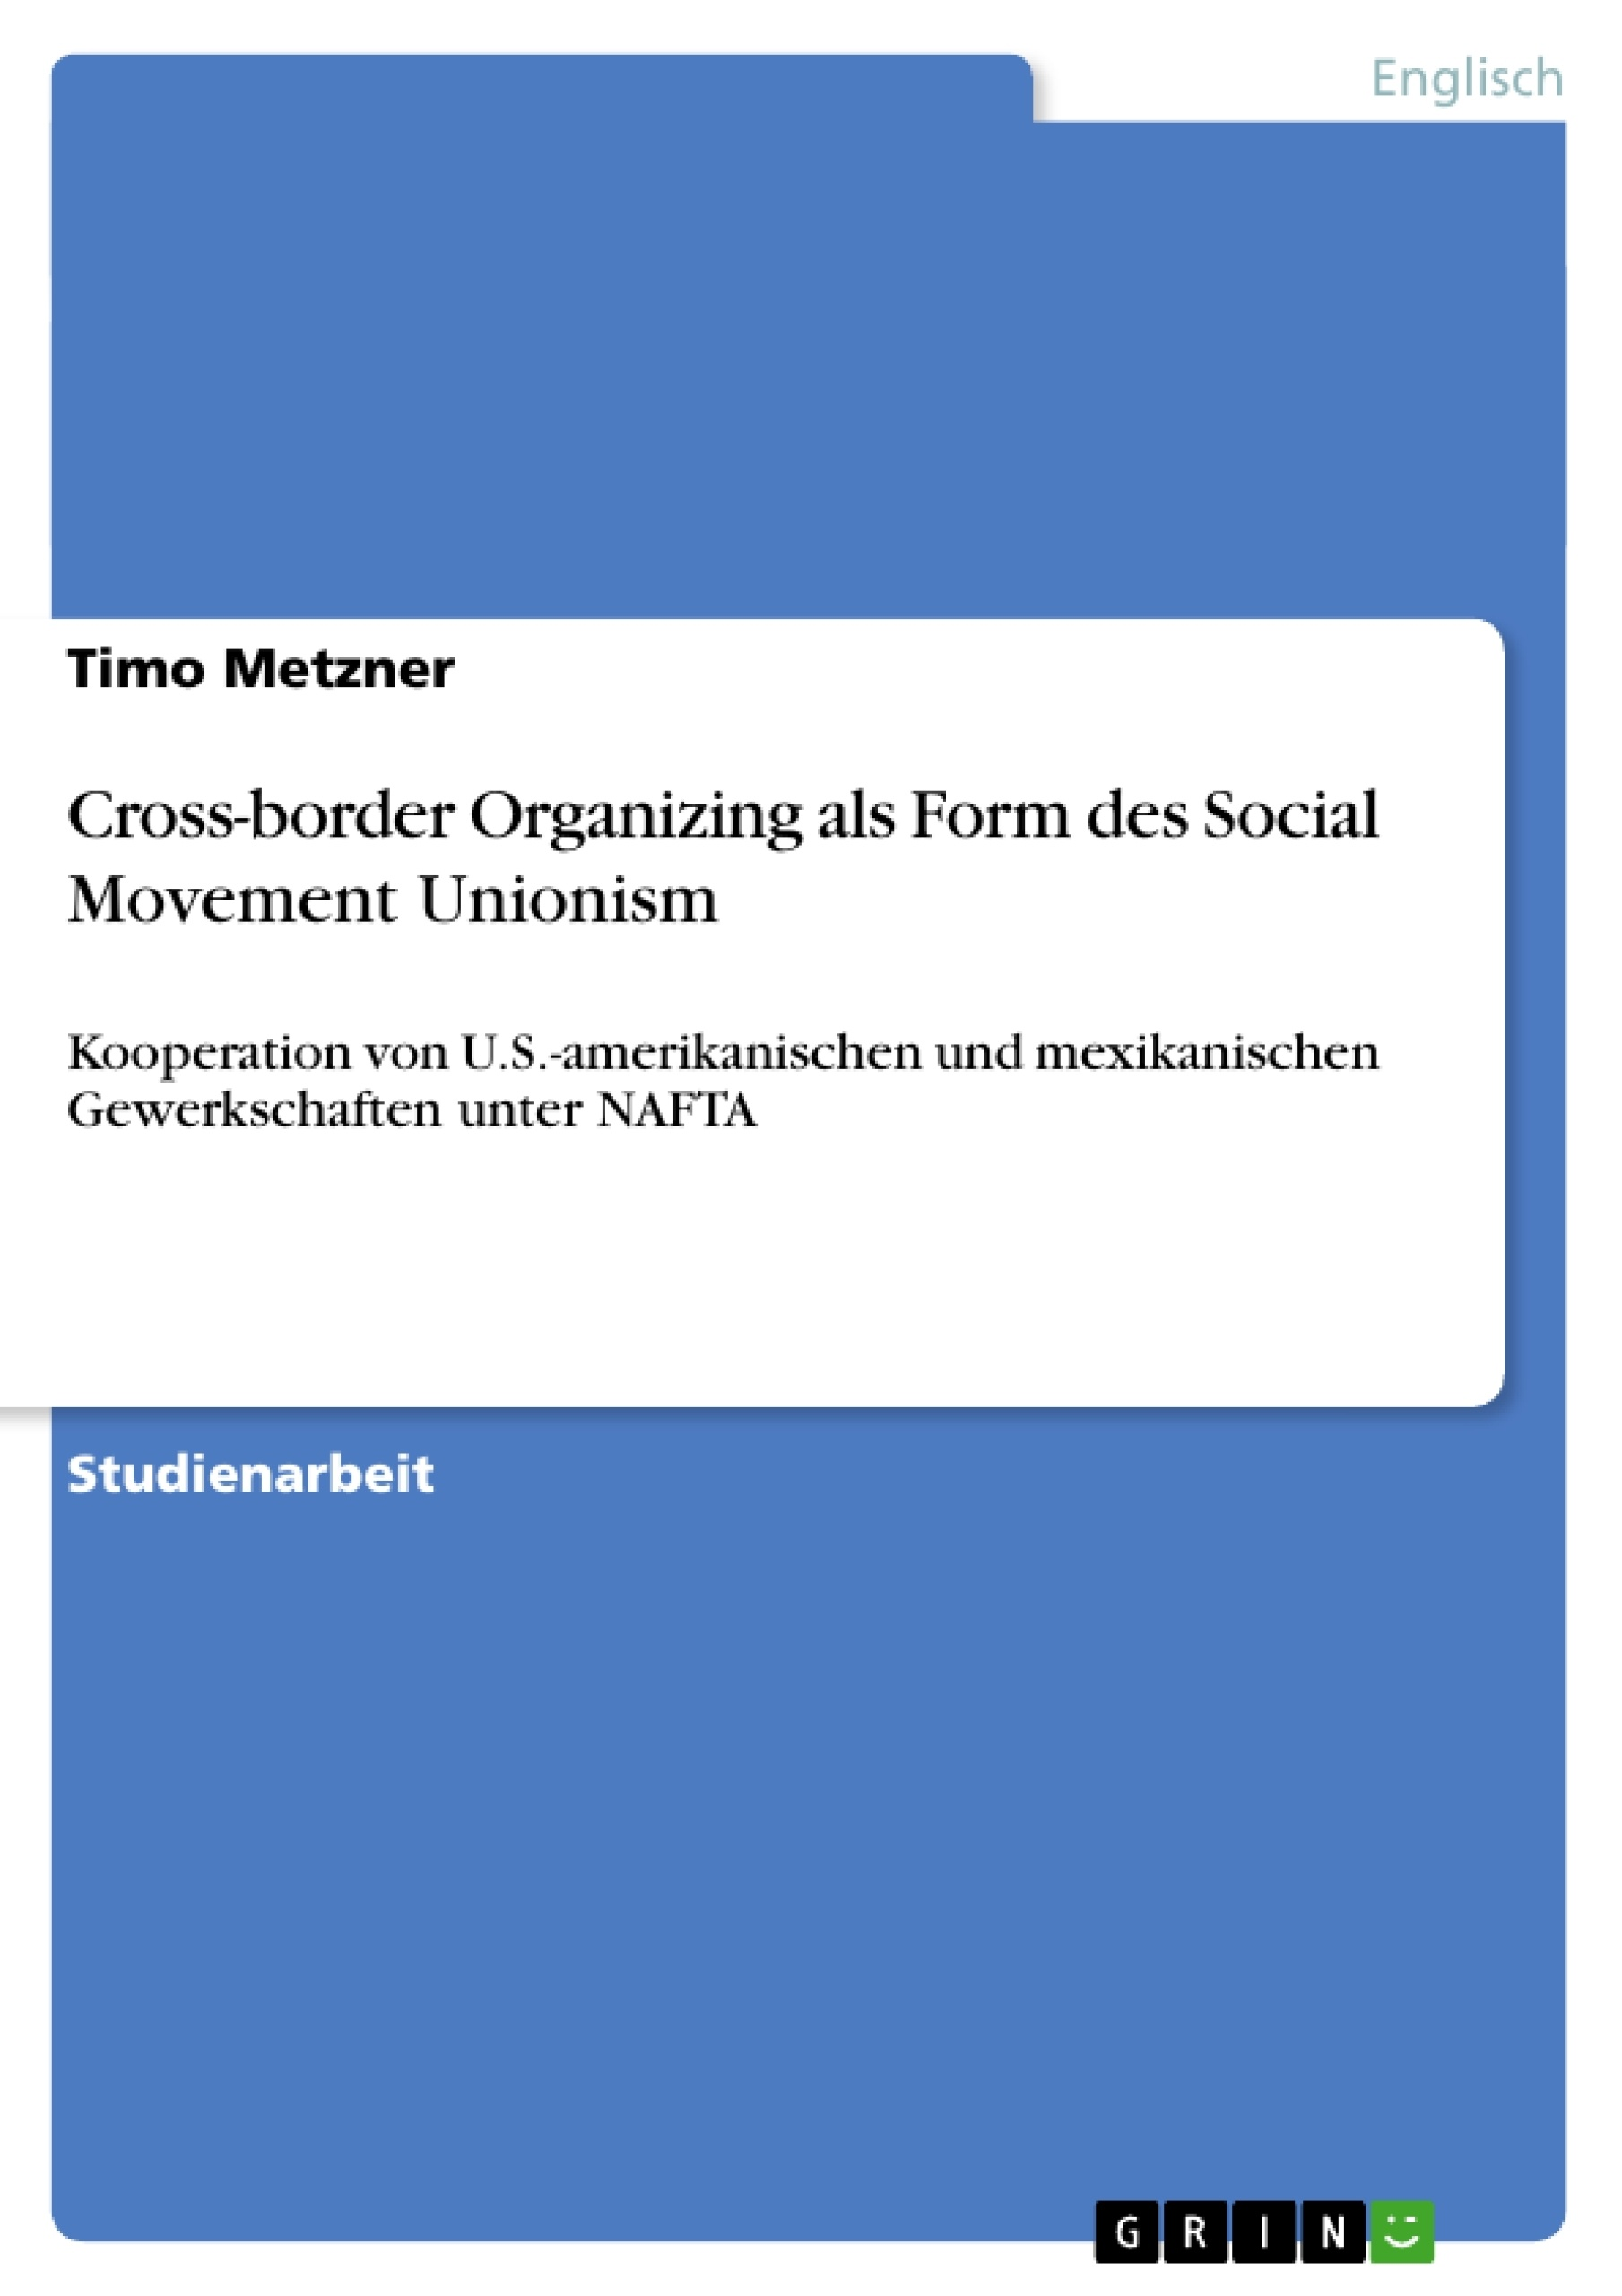 Titel: Cross-border Organizing als Form des Social Movement Unionism